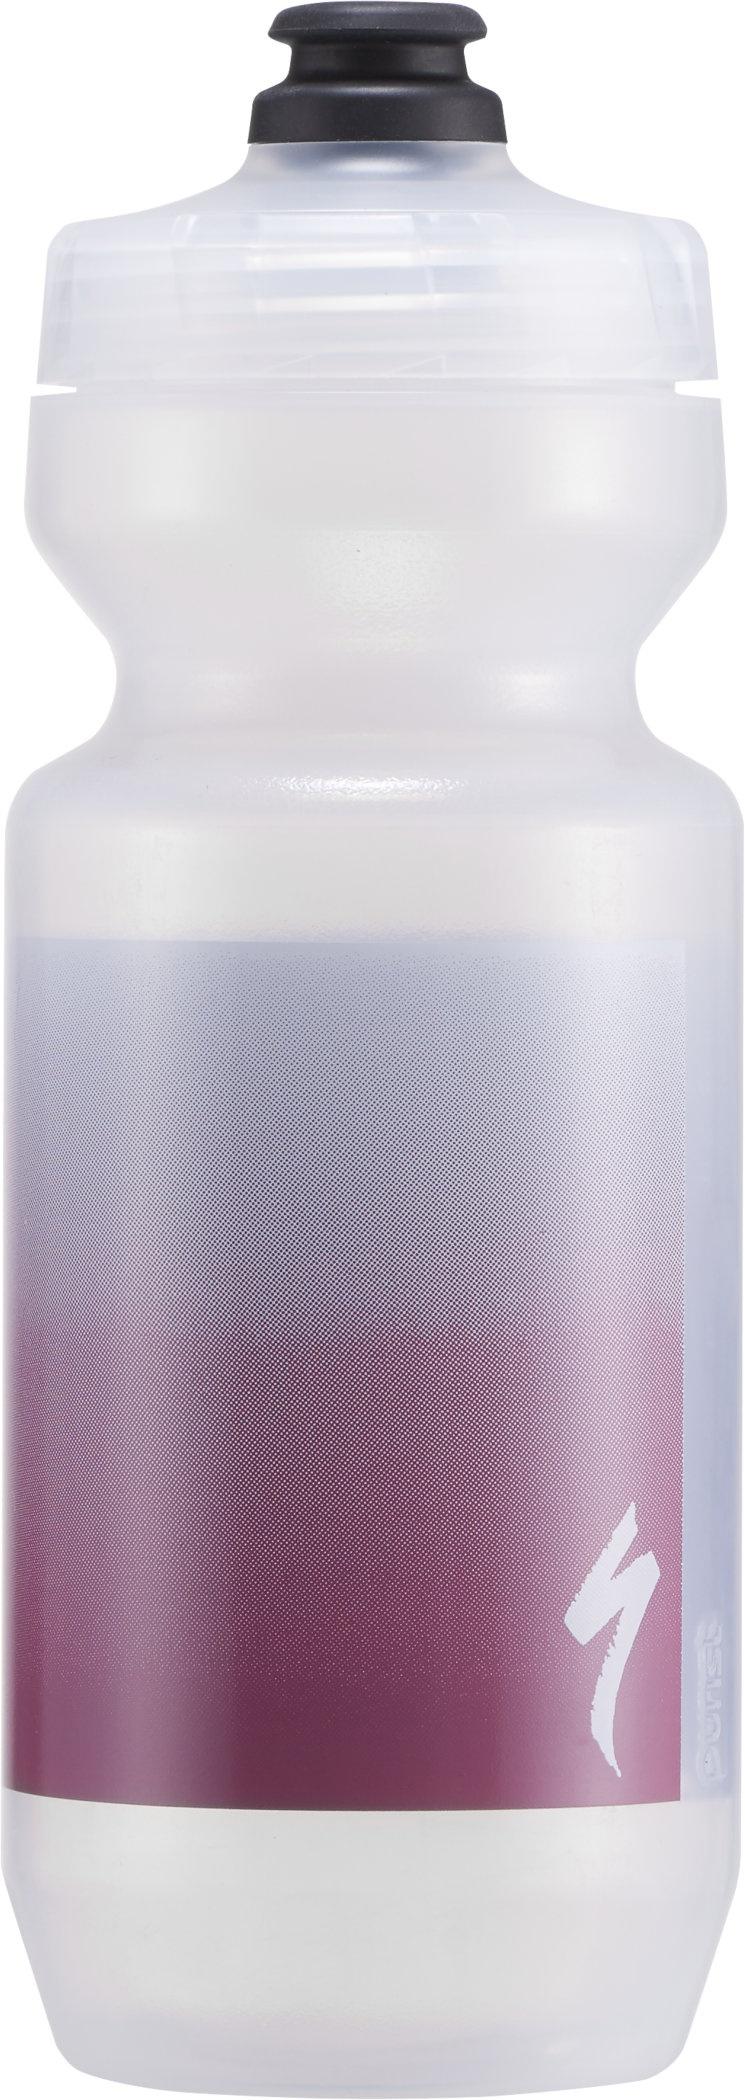 Køb Specialized Purist MoFlo 650ml drikkedunk – Clear Blue